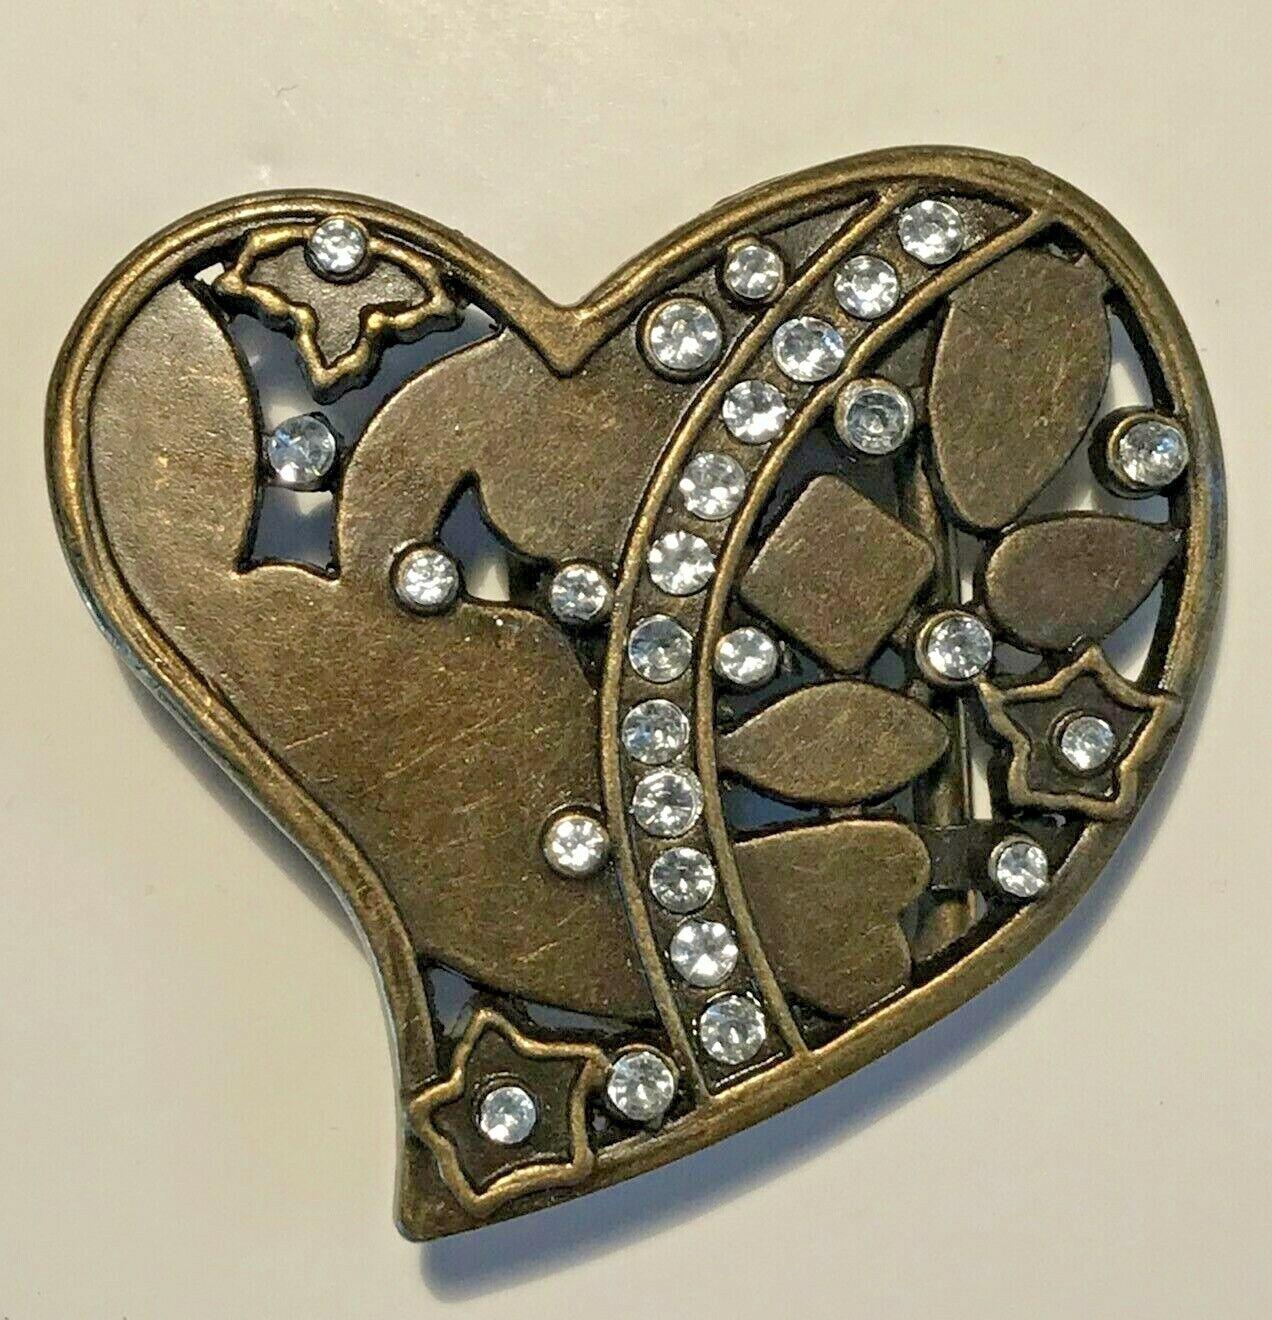 Woman's Belt Buckle Rhinestone Studded Heart Shaped 2R1-13